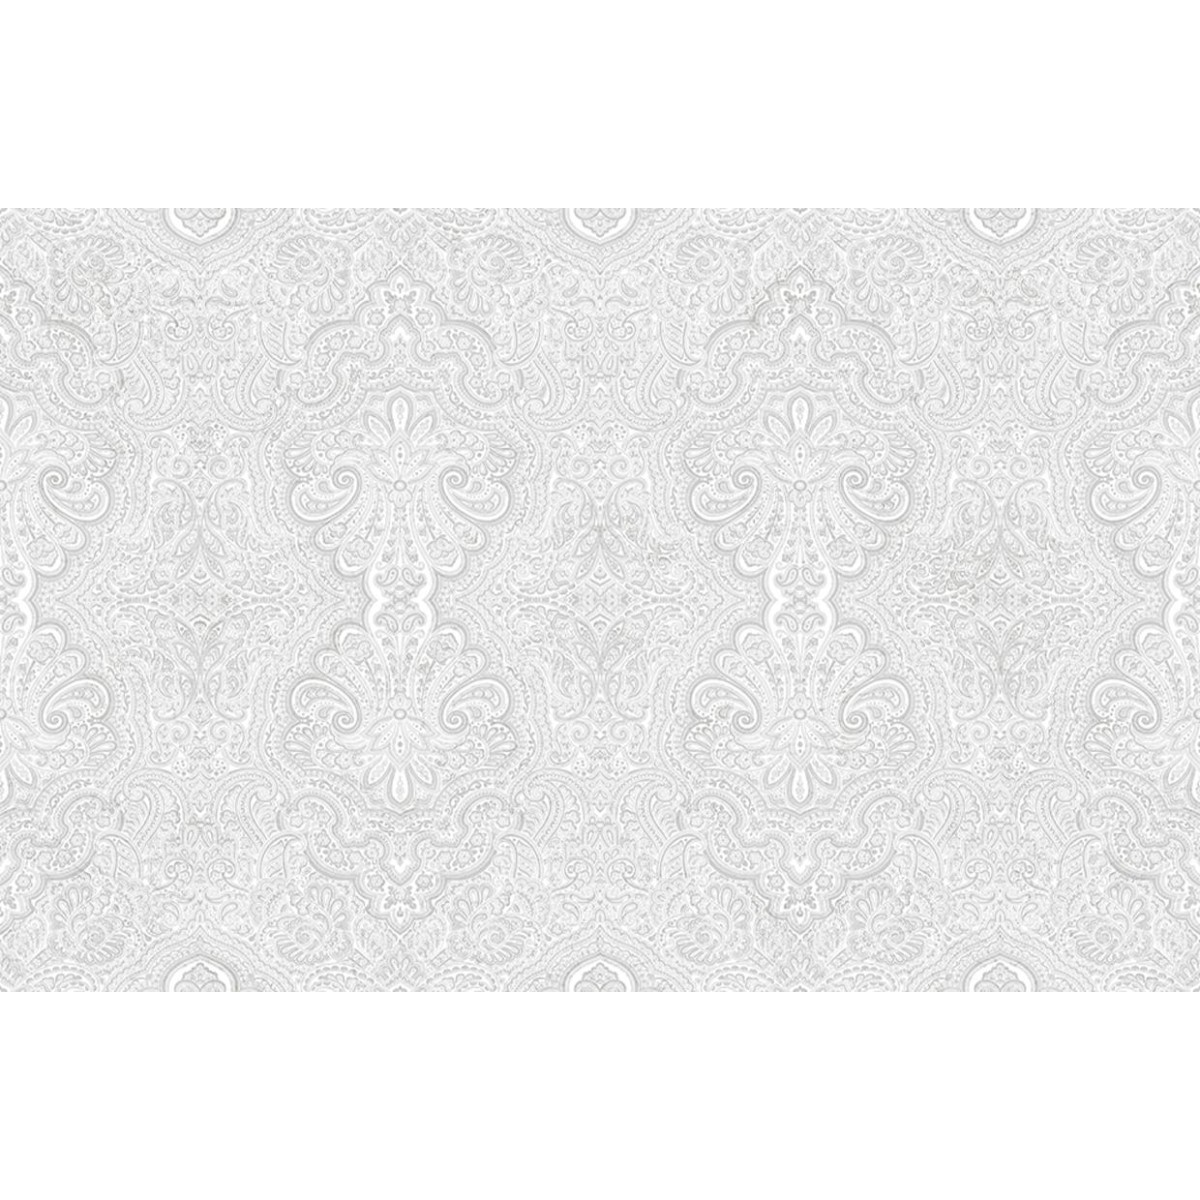 Обои флизелиновые Erismann Neochic серые 60050-03 1.06 м